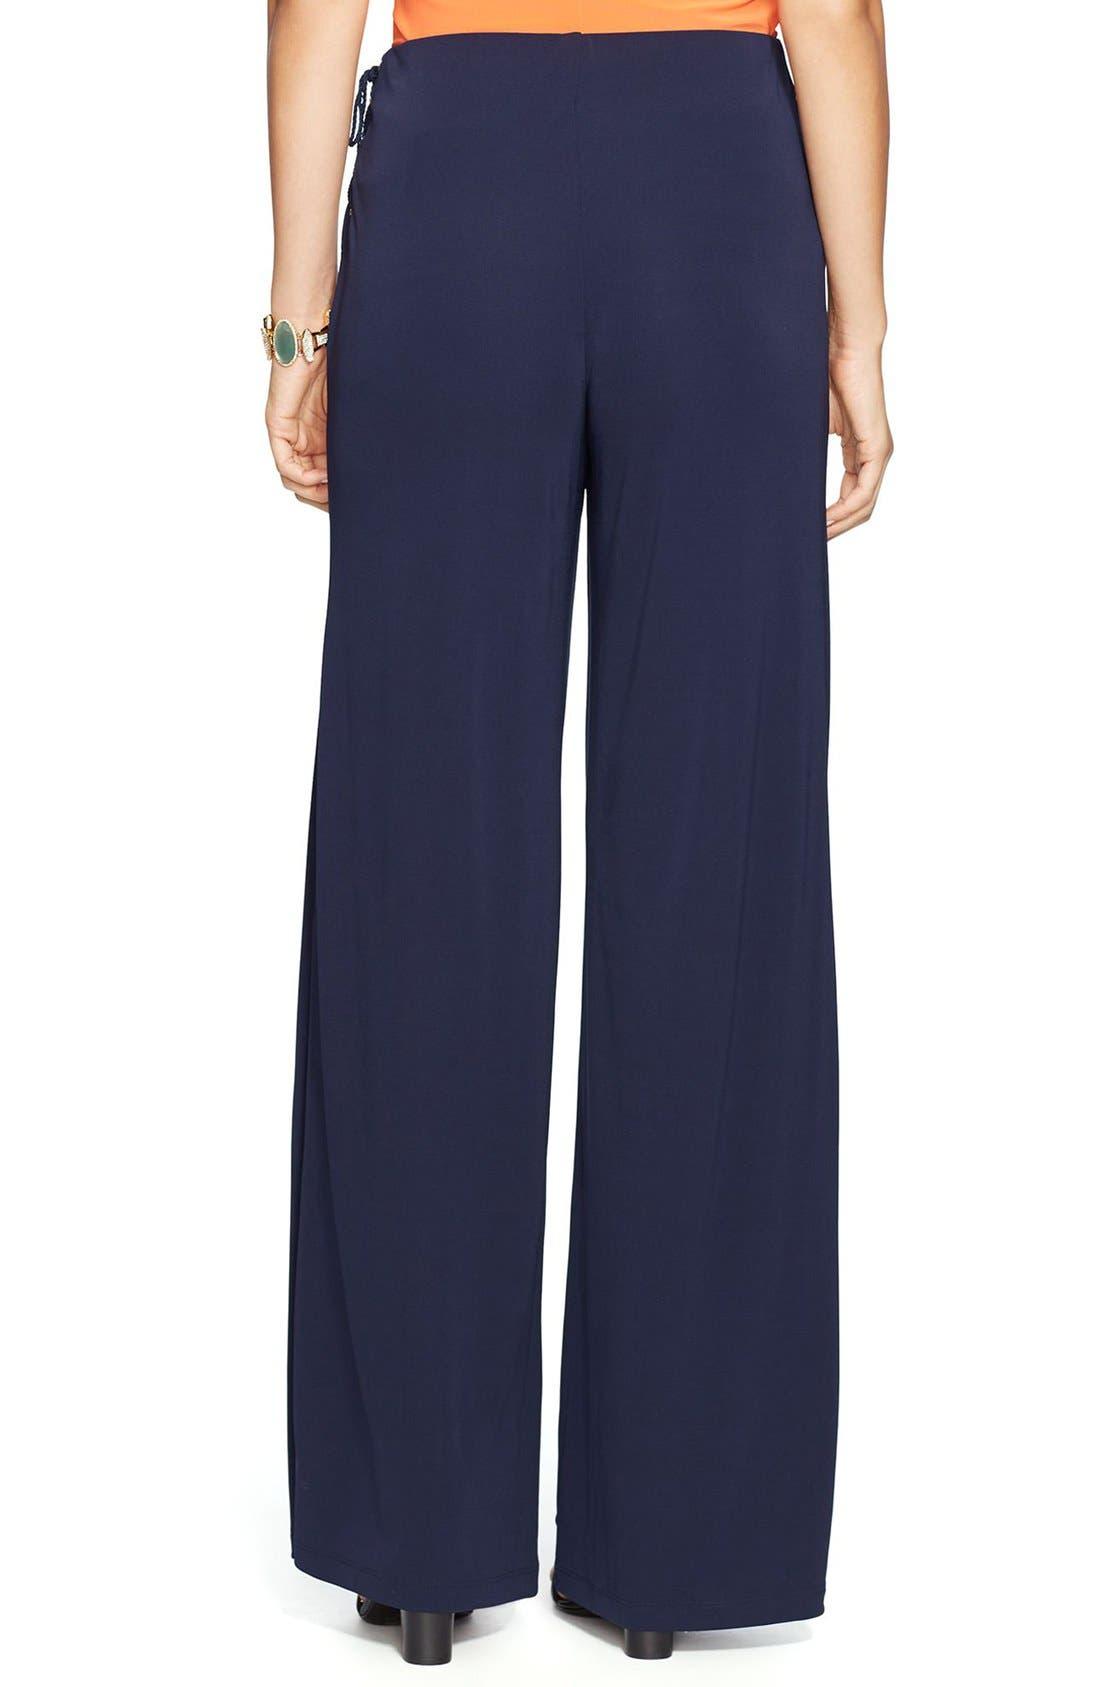 Alternate Image 2  - Lauren Ralph Lauren Lace-Up Wide Leg Jersey Pants